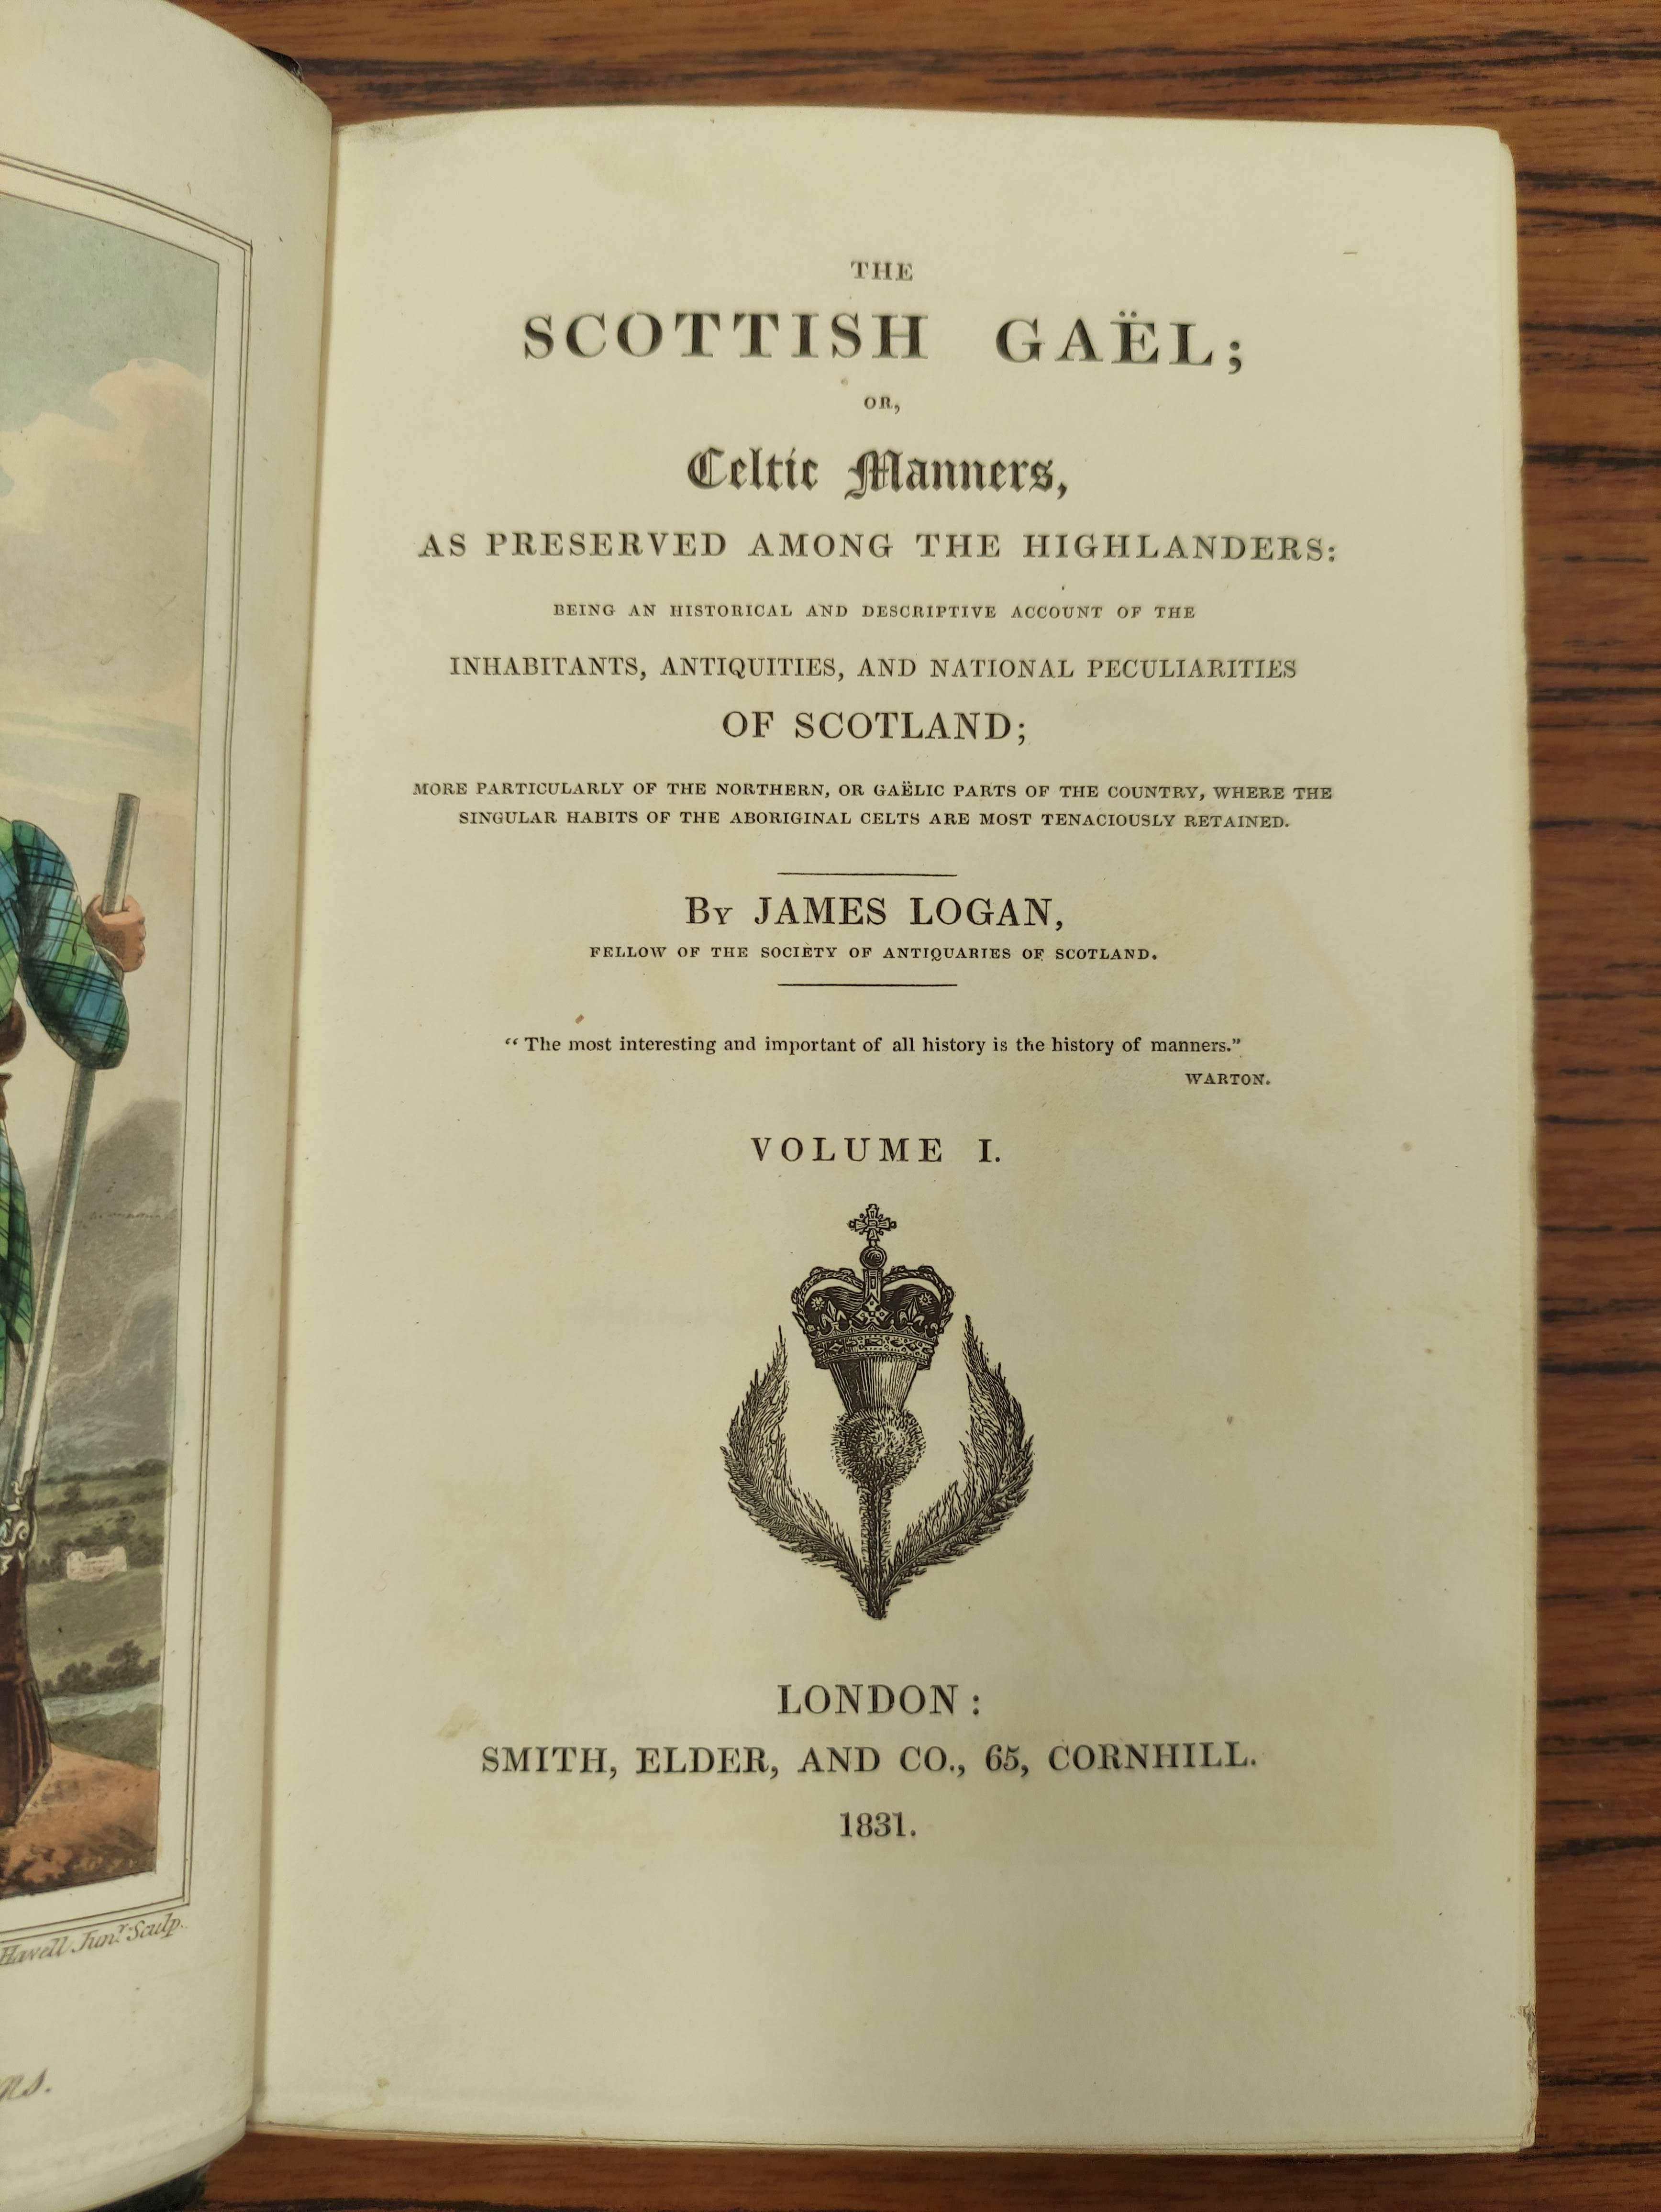 LOGAN JAMES.The Scottish Gael. 2 vols. Col. frontis & text illus. Half green morocco. A nice - Image 3 of 10